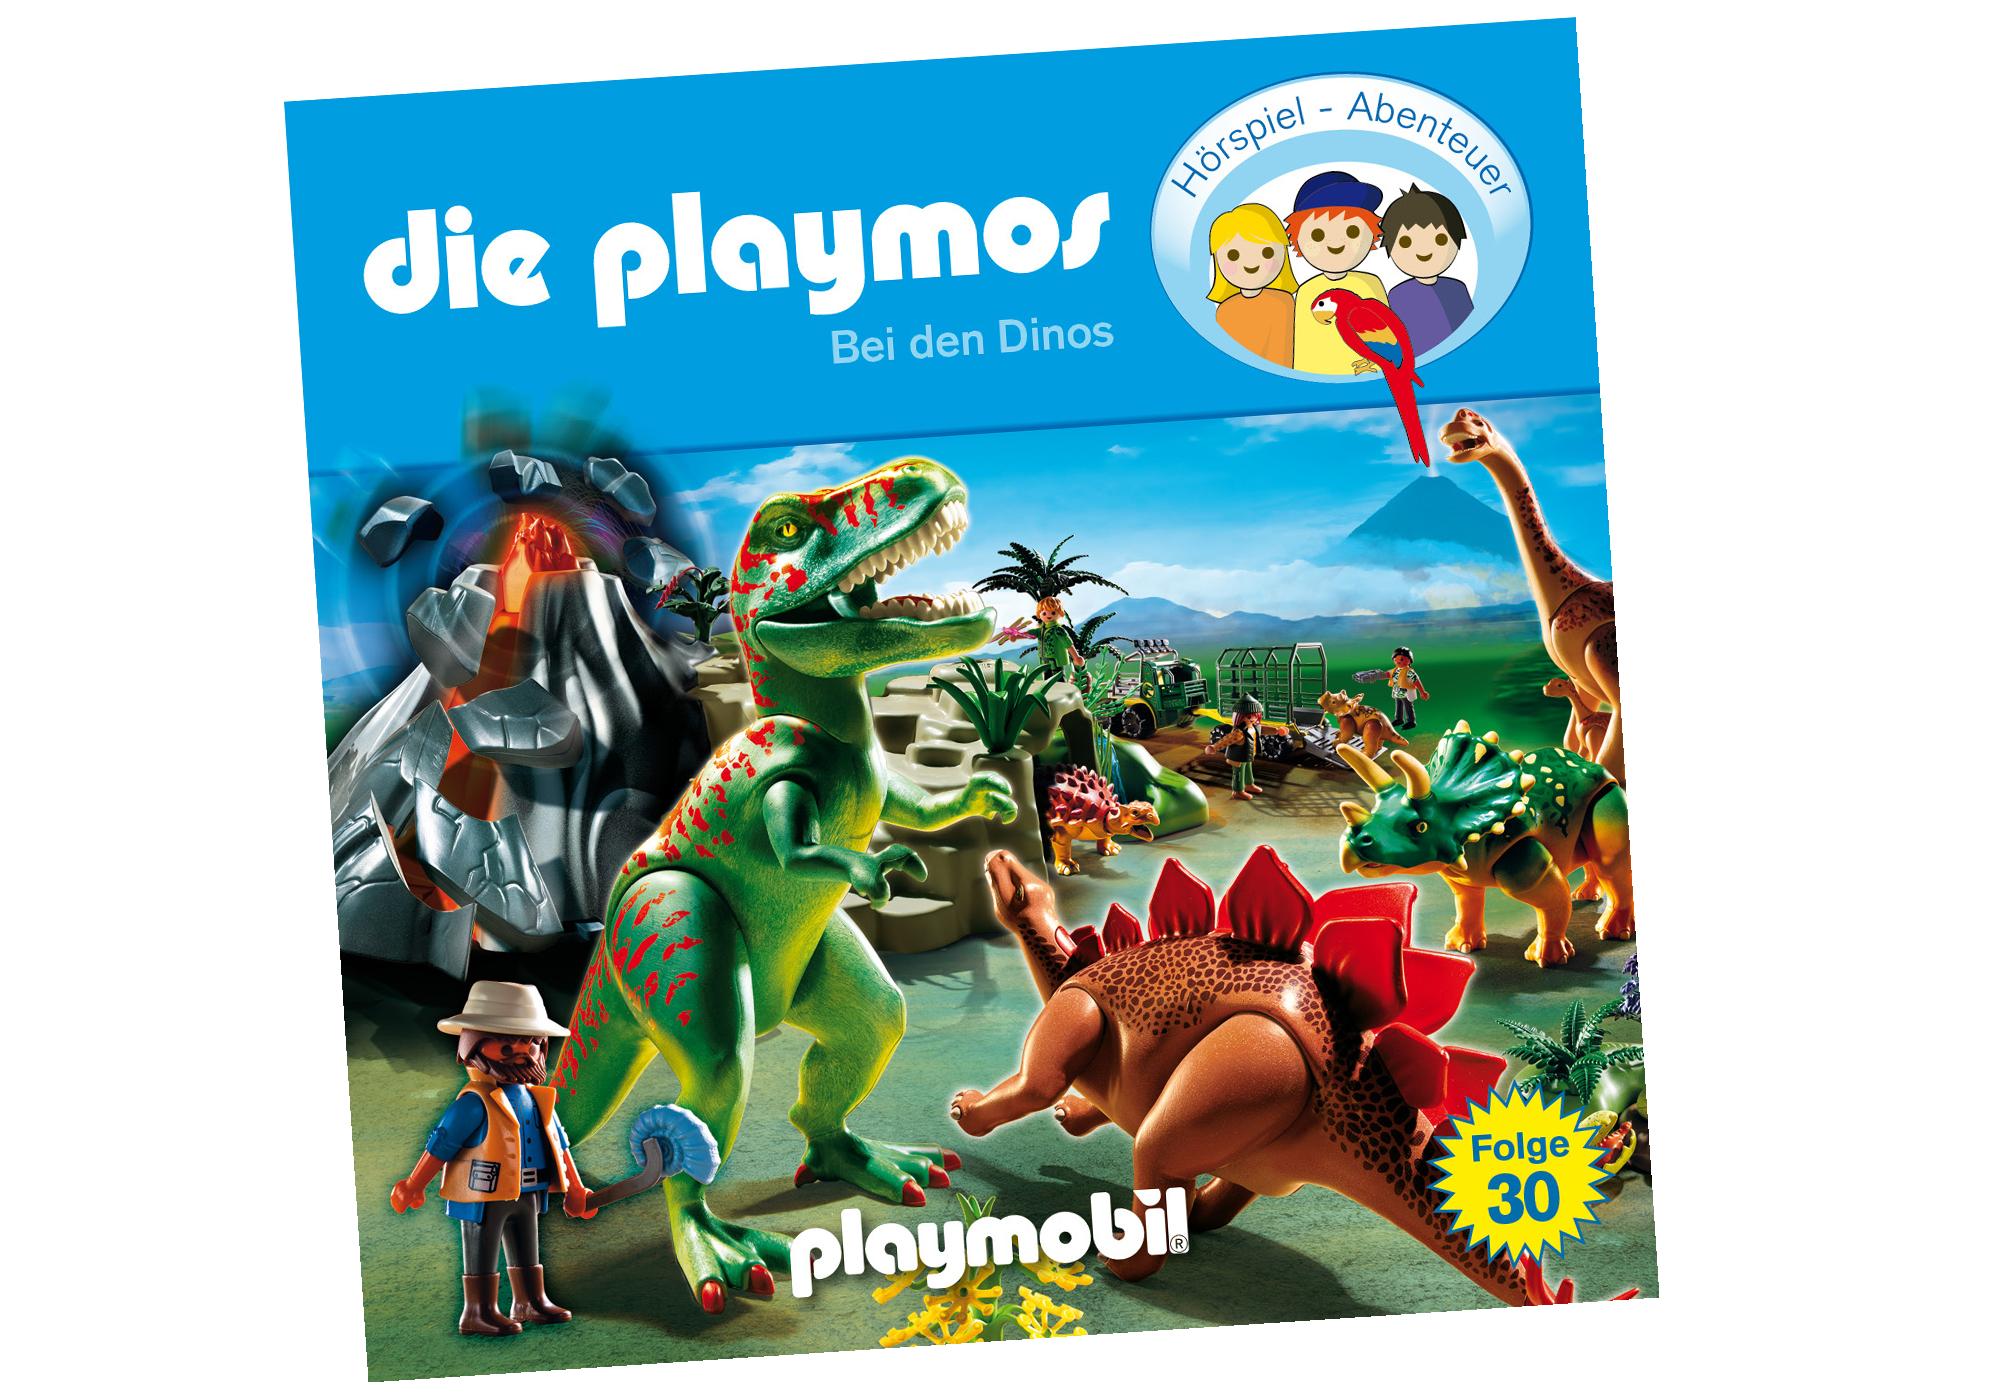 http://media.playmobil.com/i/playmobil/80346_product_detail/Bei den Dinos (30) - CD